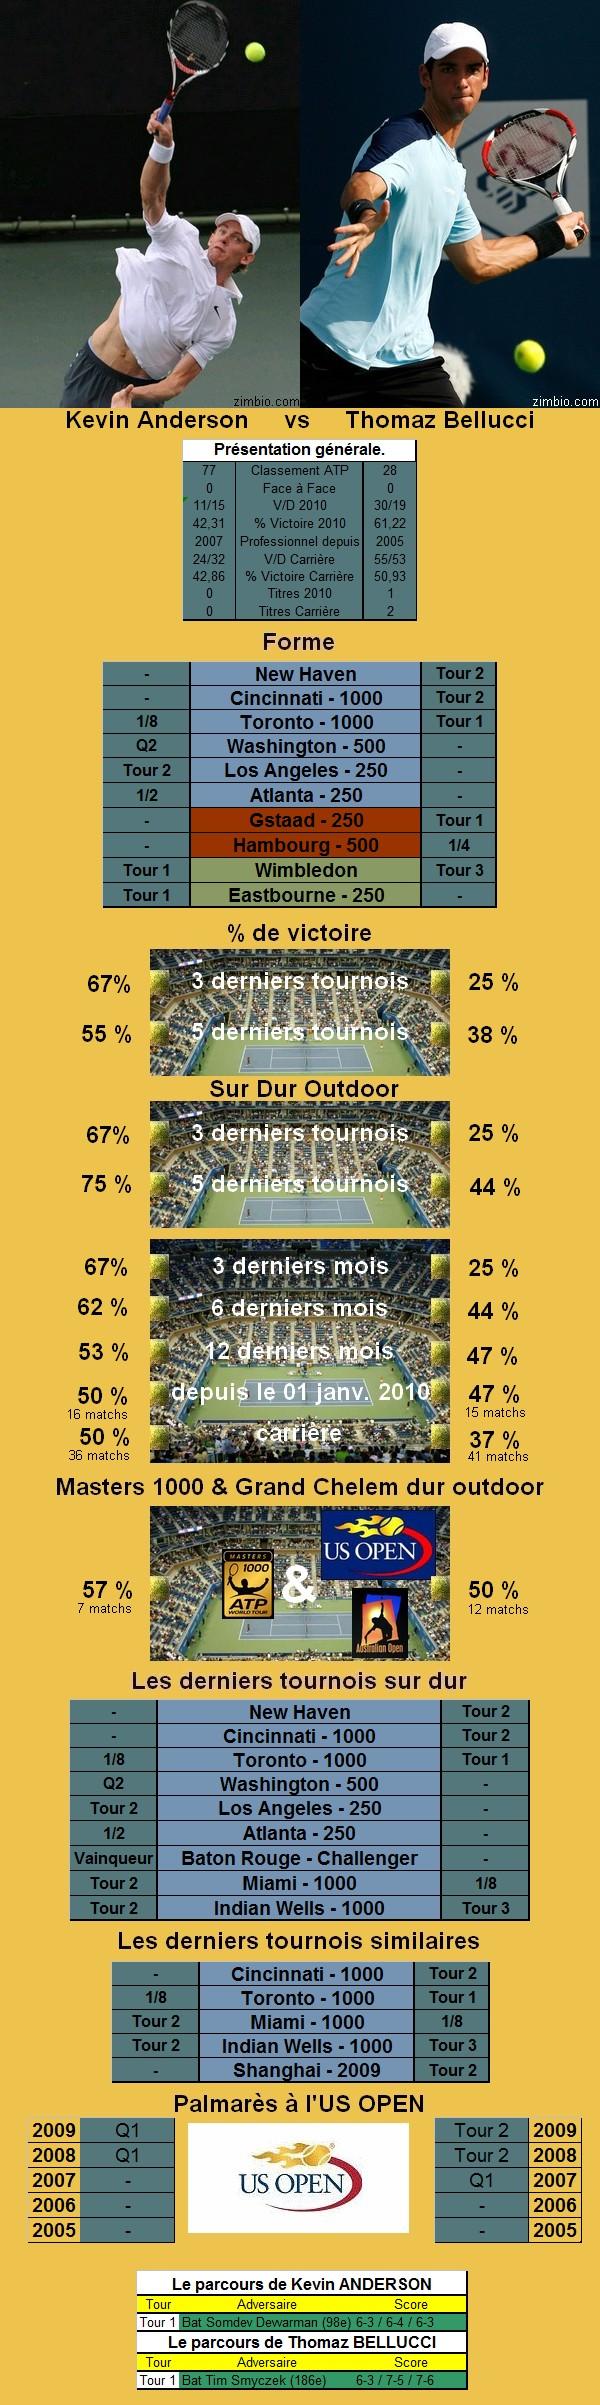 Statistiques tennis de Anderson contre Bellucci à l'US OPEN